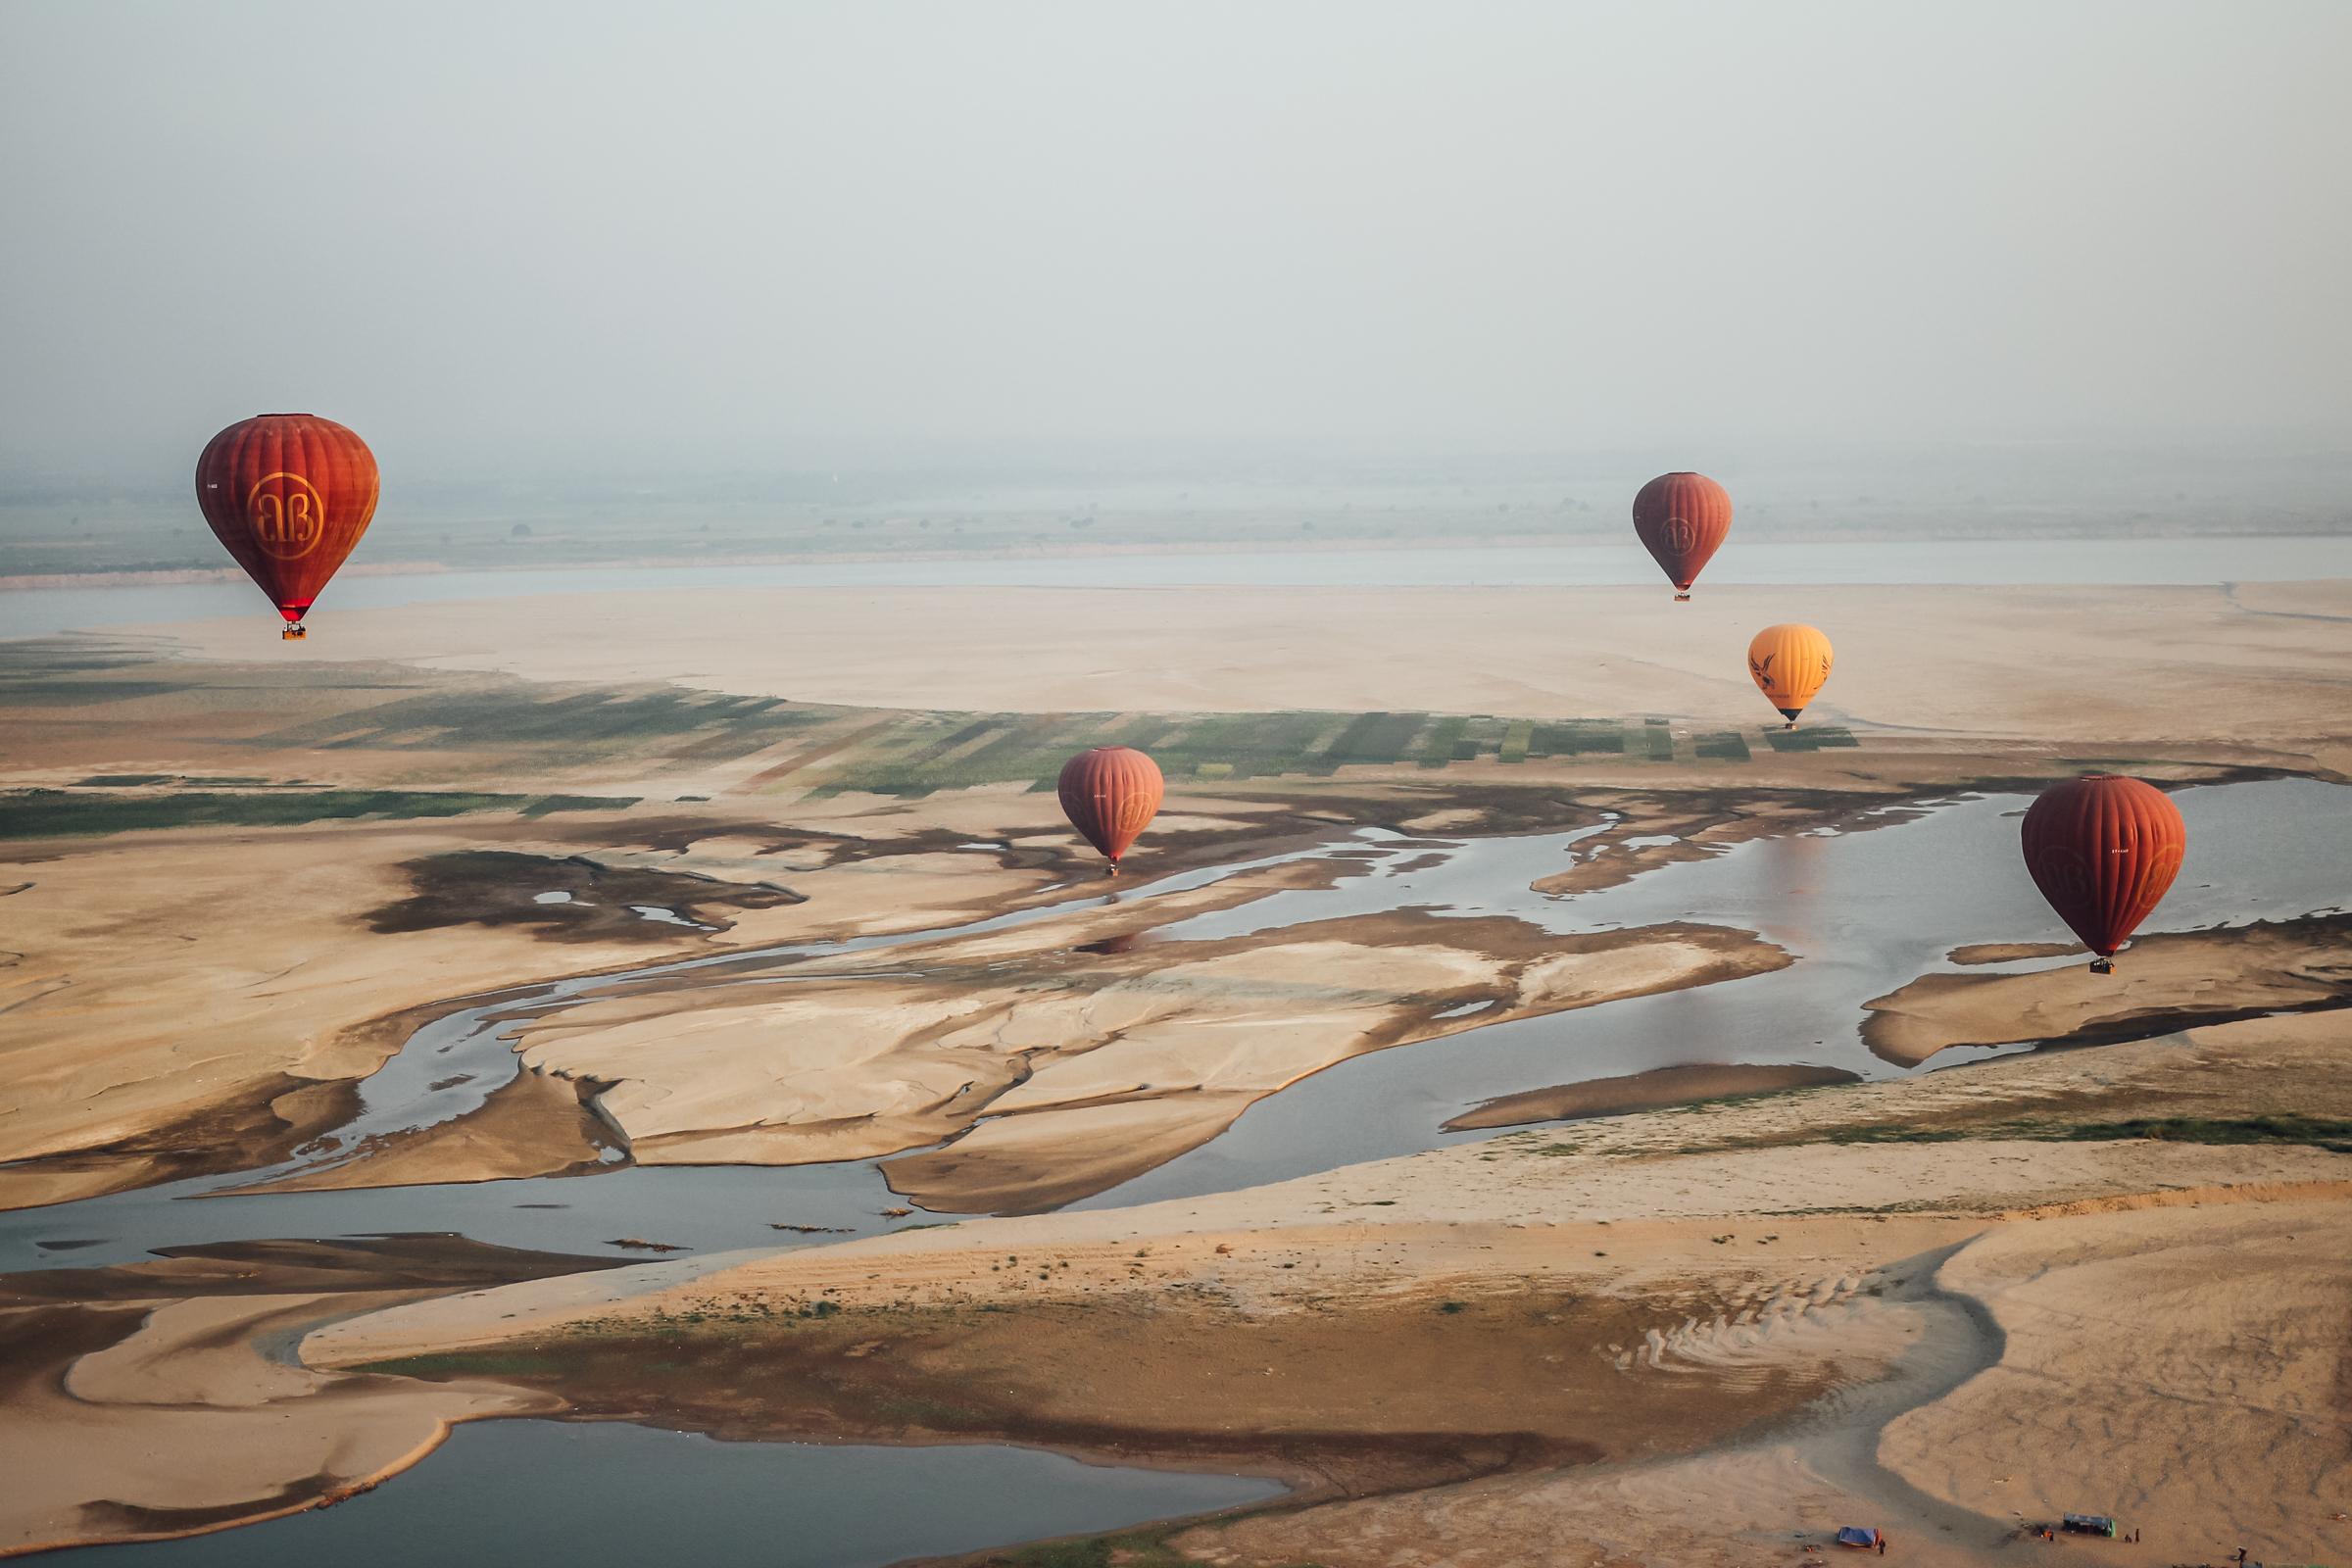 Dreams Come True in Hot Air Balloons